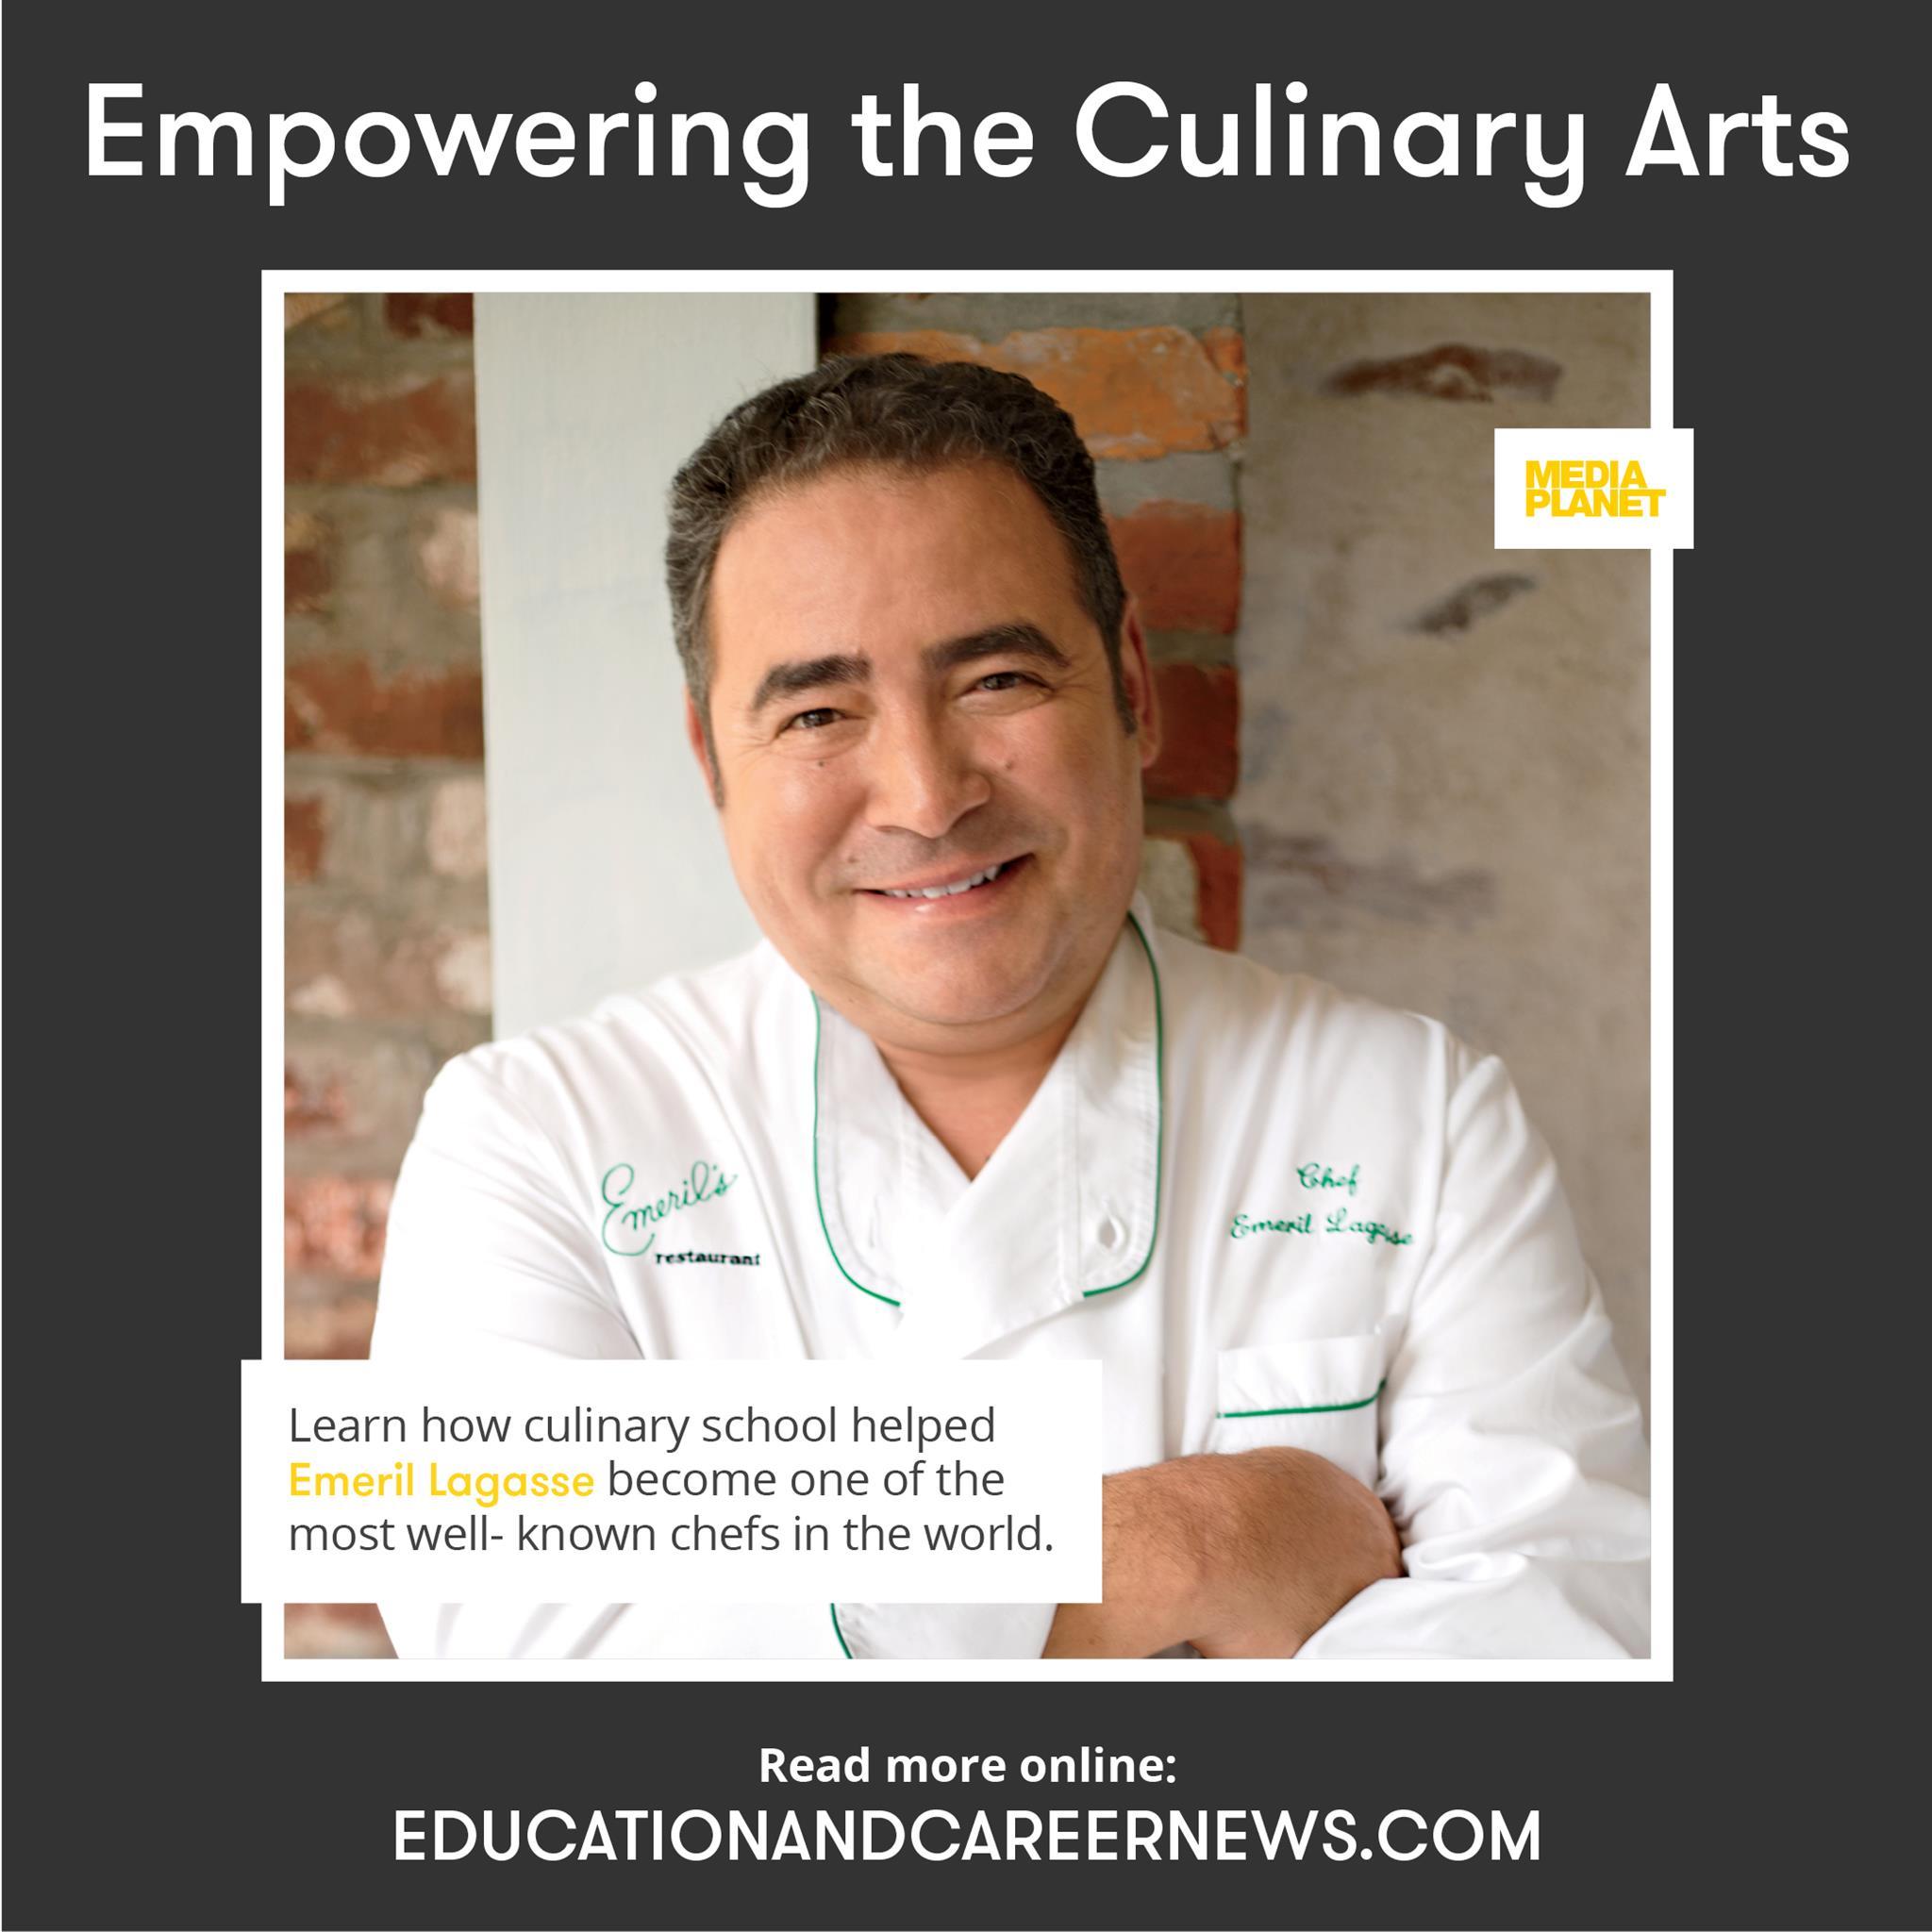 CulinaryCareers_InfluencerShareable.jpg